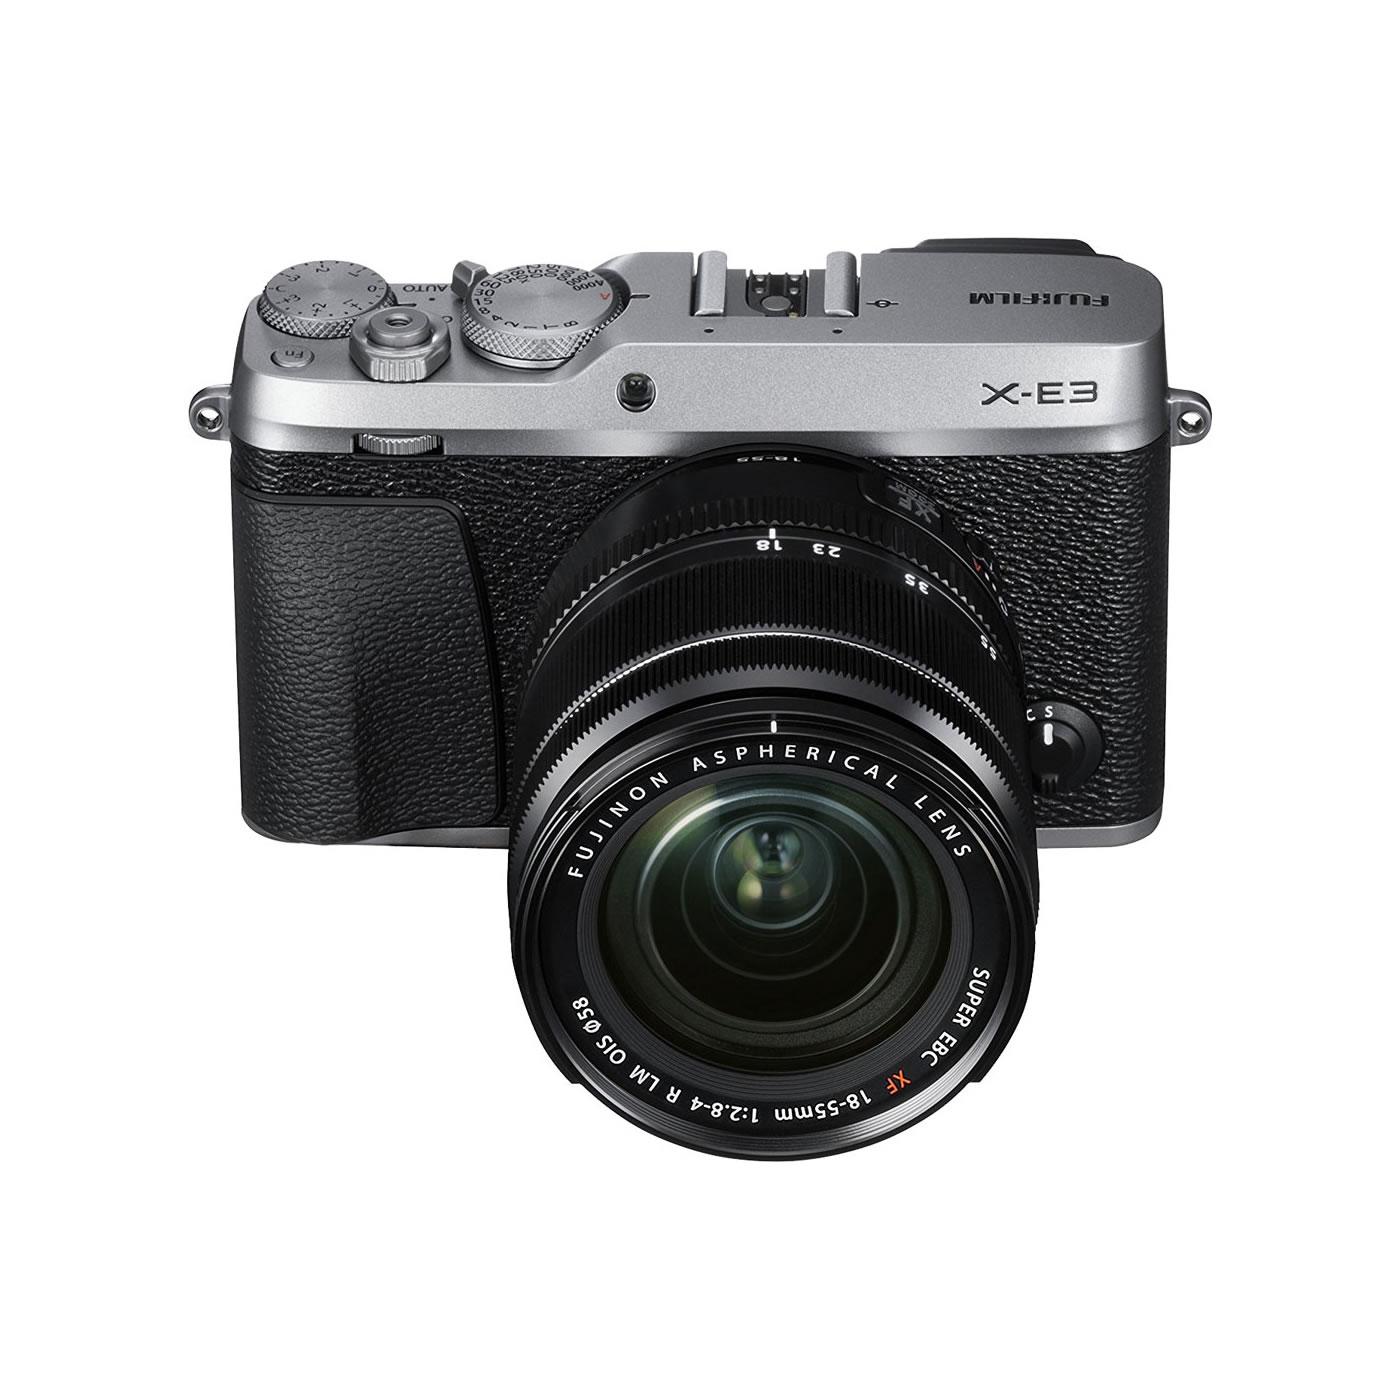 Fujifilm X E3 Kit Silber Xf 18 55mm F28 4 R Lm Ois D10691 Sk Fujinon Xf18